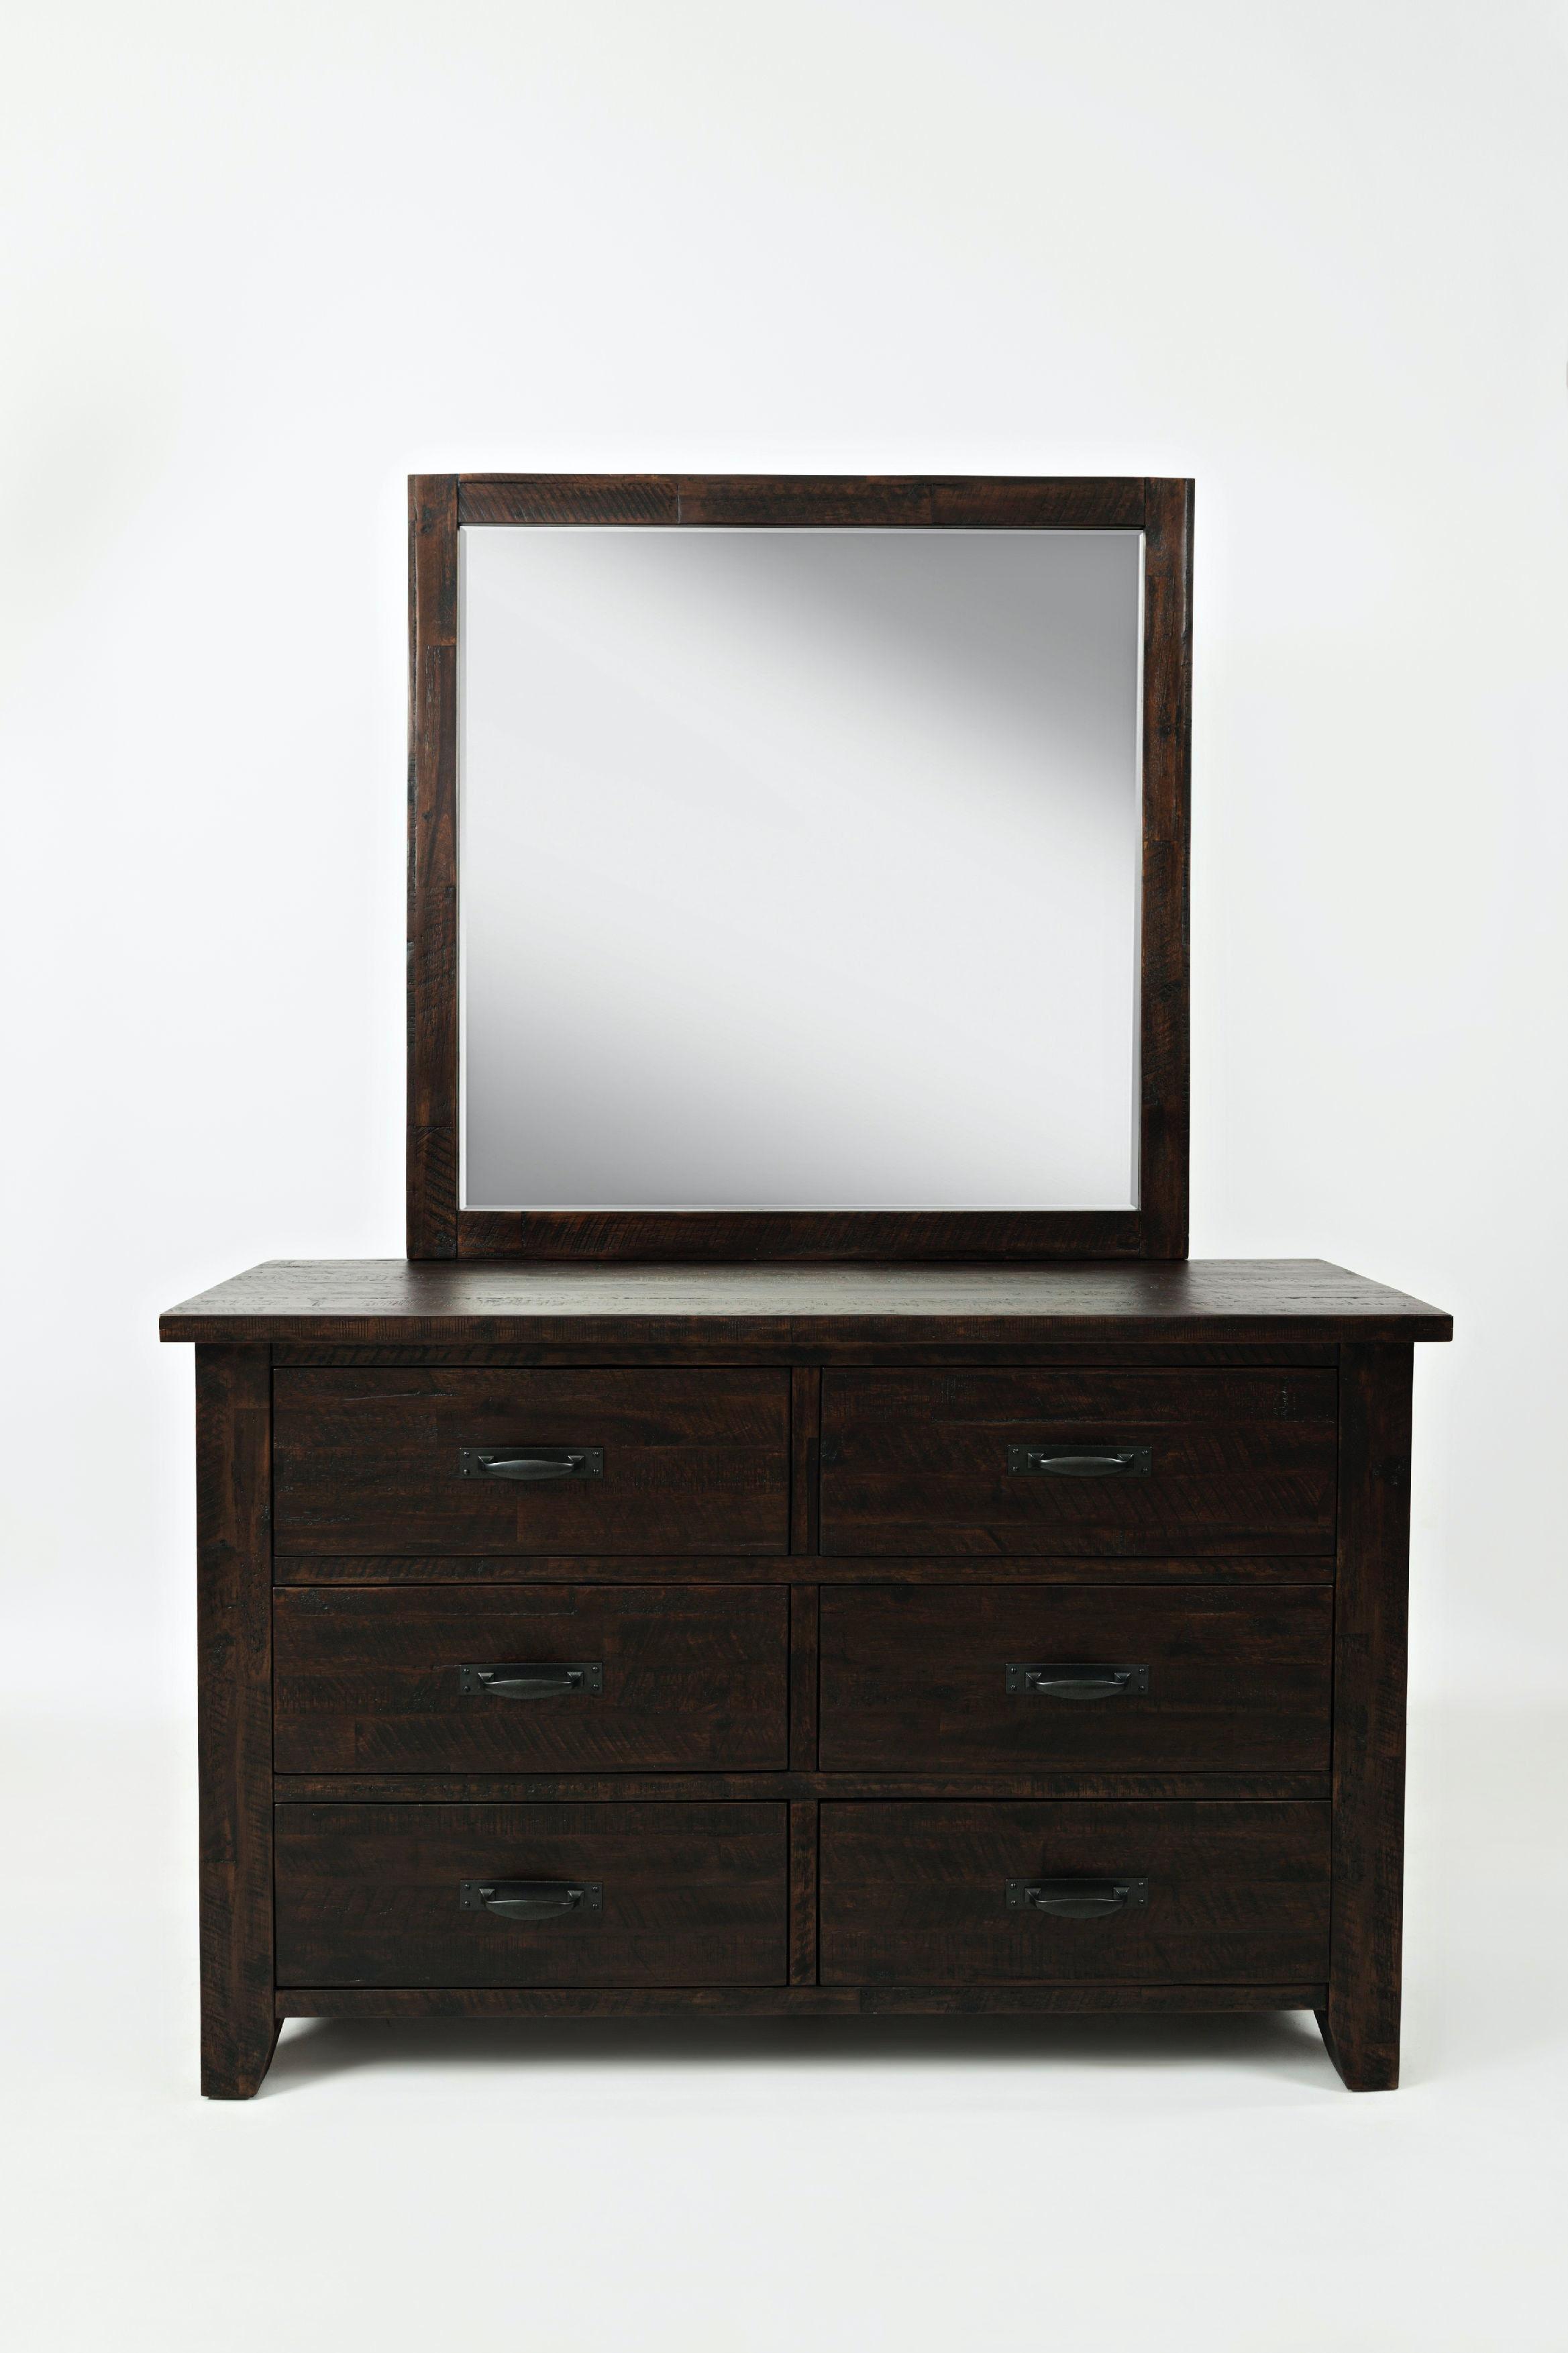 Jofran Bedroom Double Dresser Assembled 1605 10